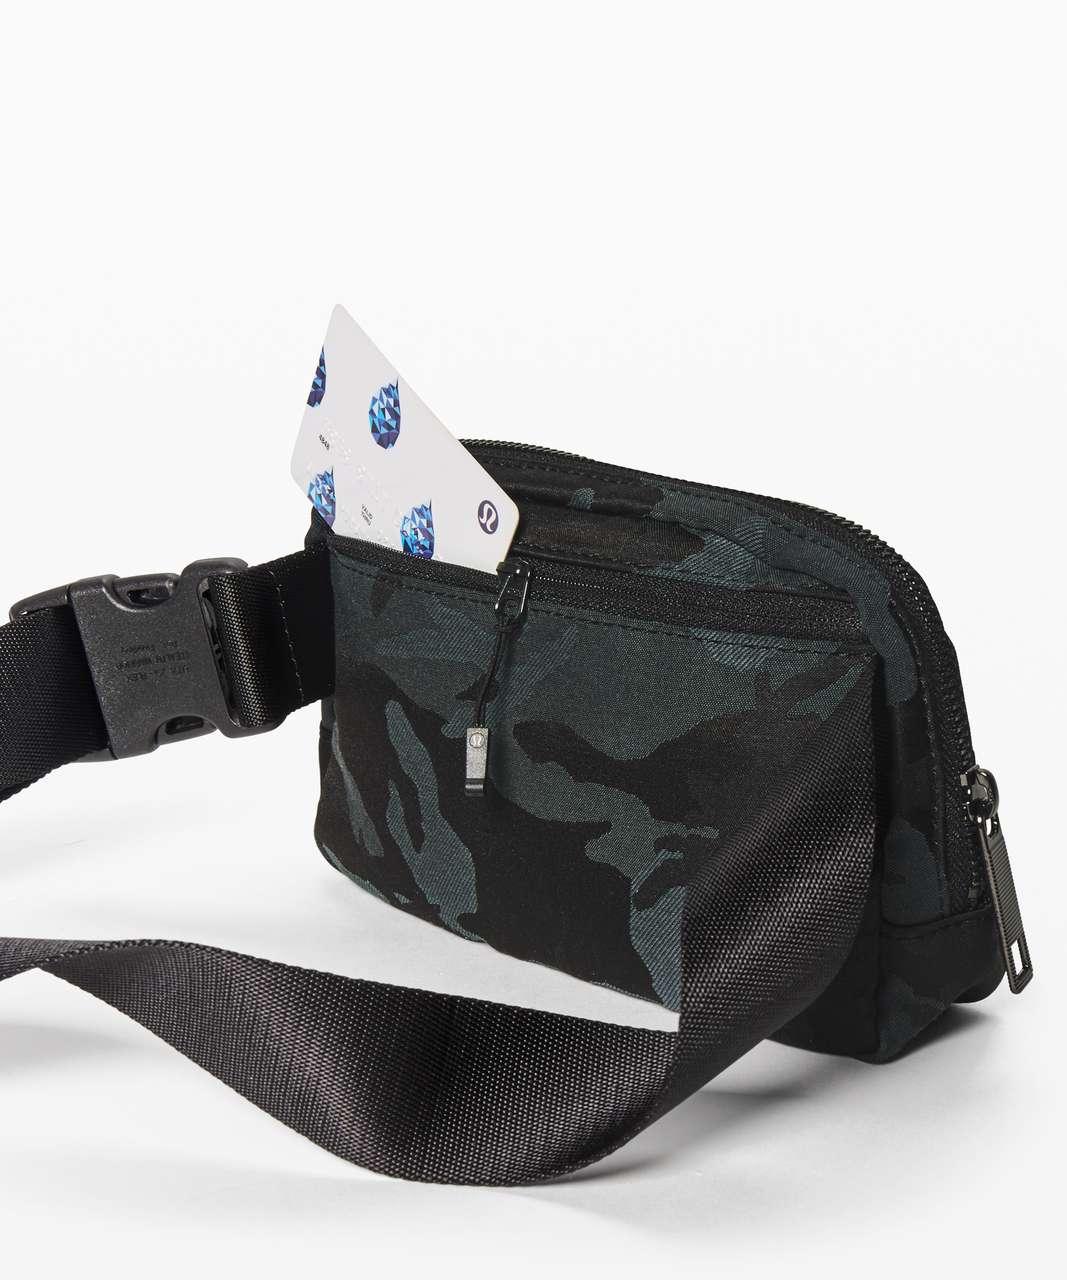 Lululemon Everywhere Belt Bag *1L - Jacquard Camo Cotton Obsidian / Black